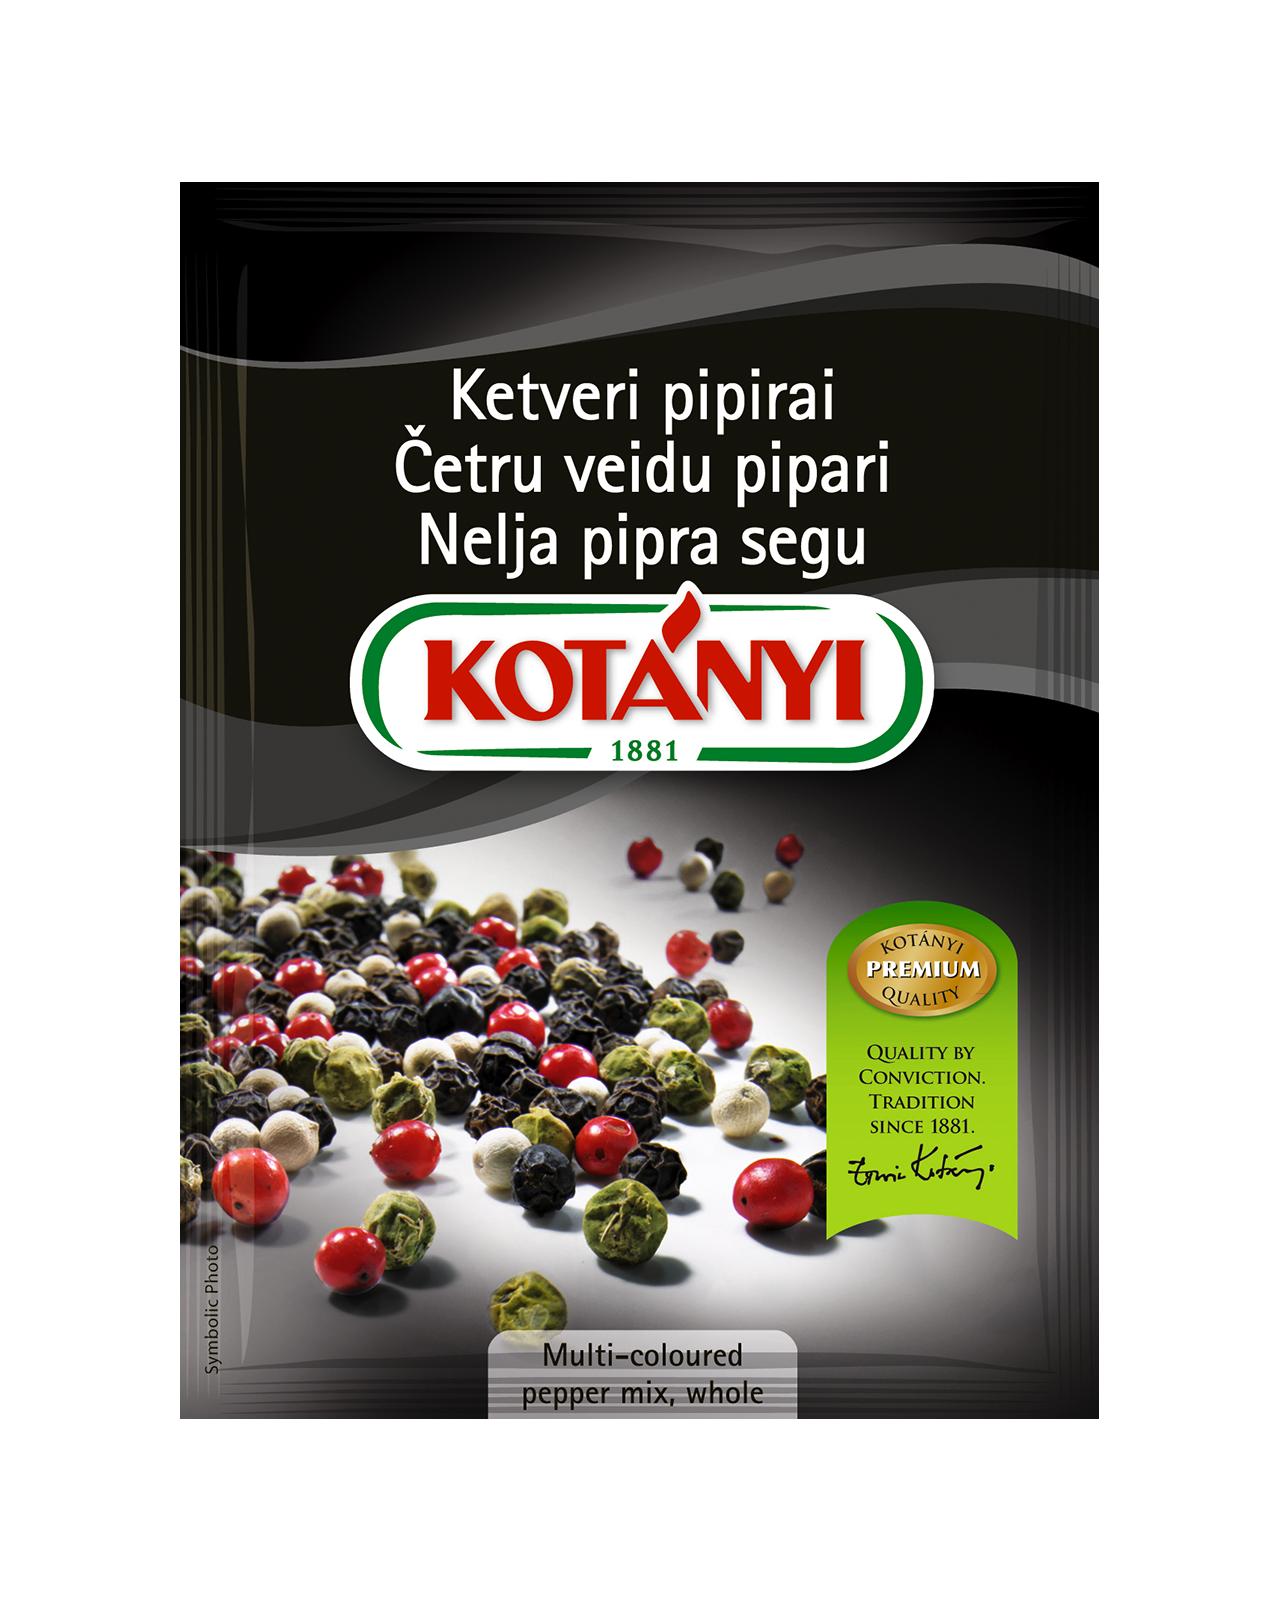 Kotányi pepper rainbow whole in a pouch